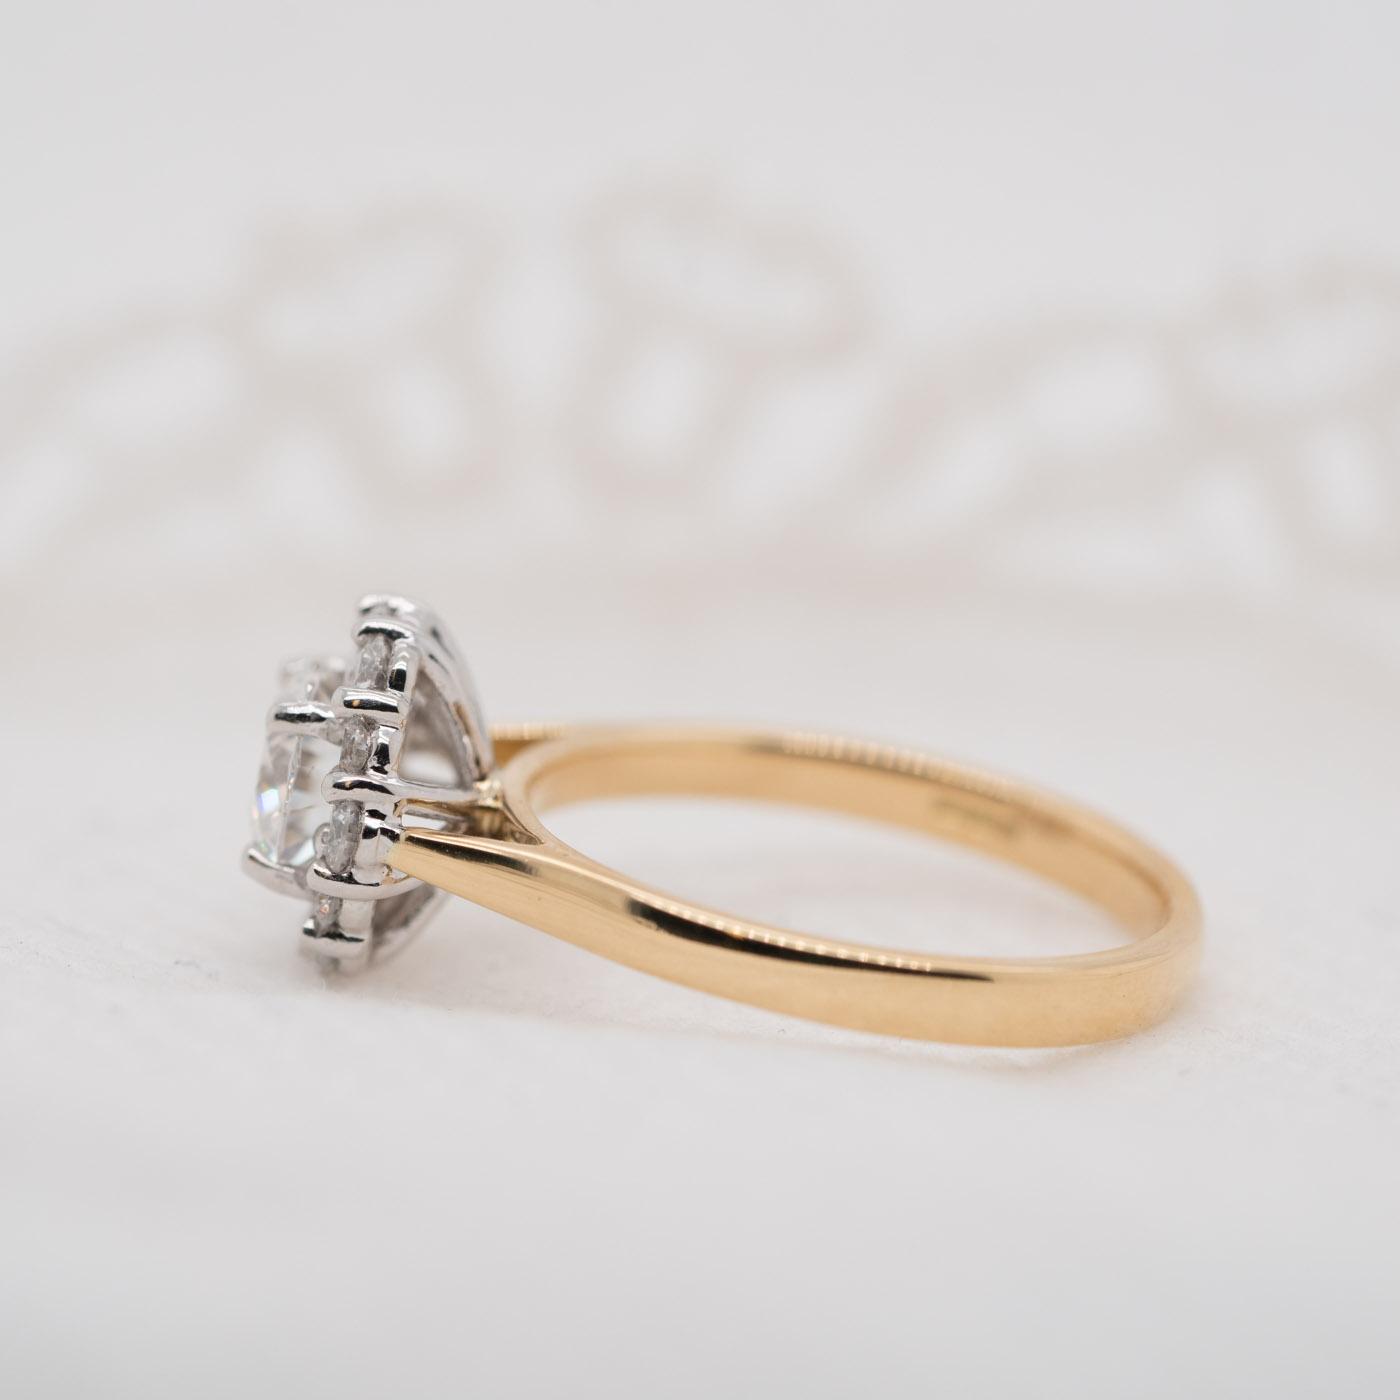 Earth Friendly Diamond Alternative Ring   Dahlia   Ethica Diamonds UK